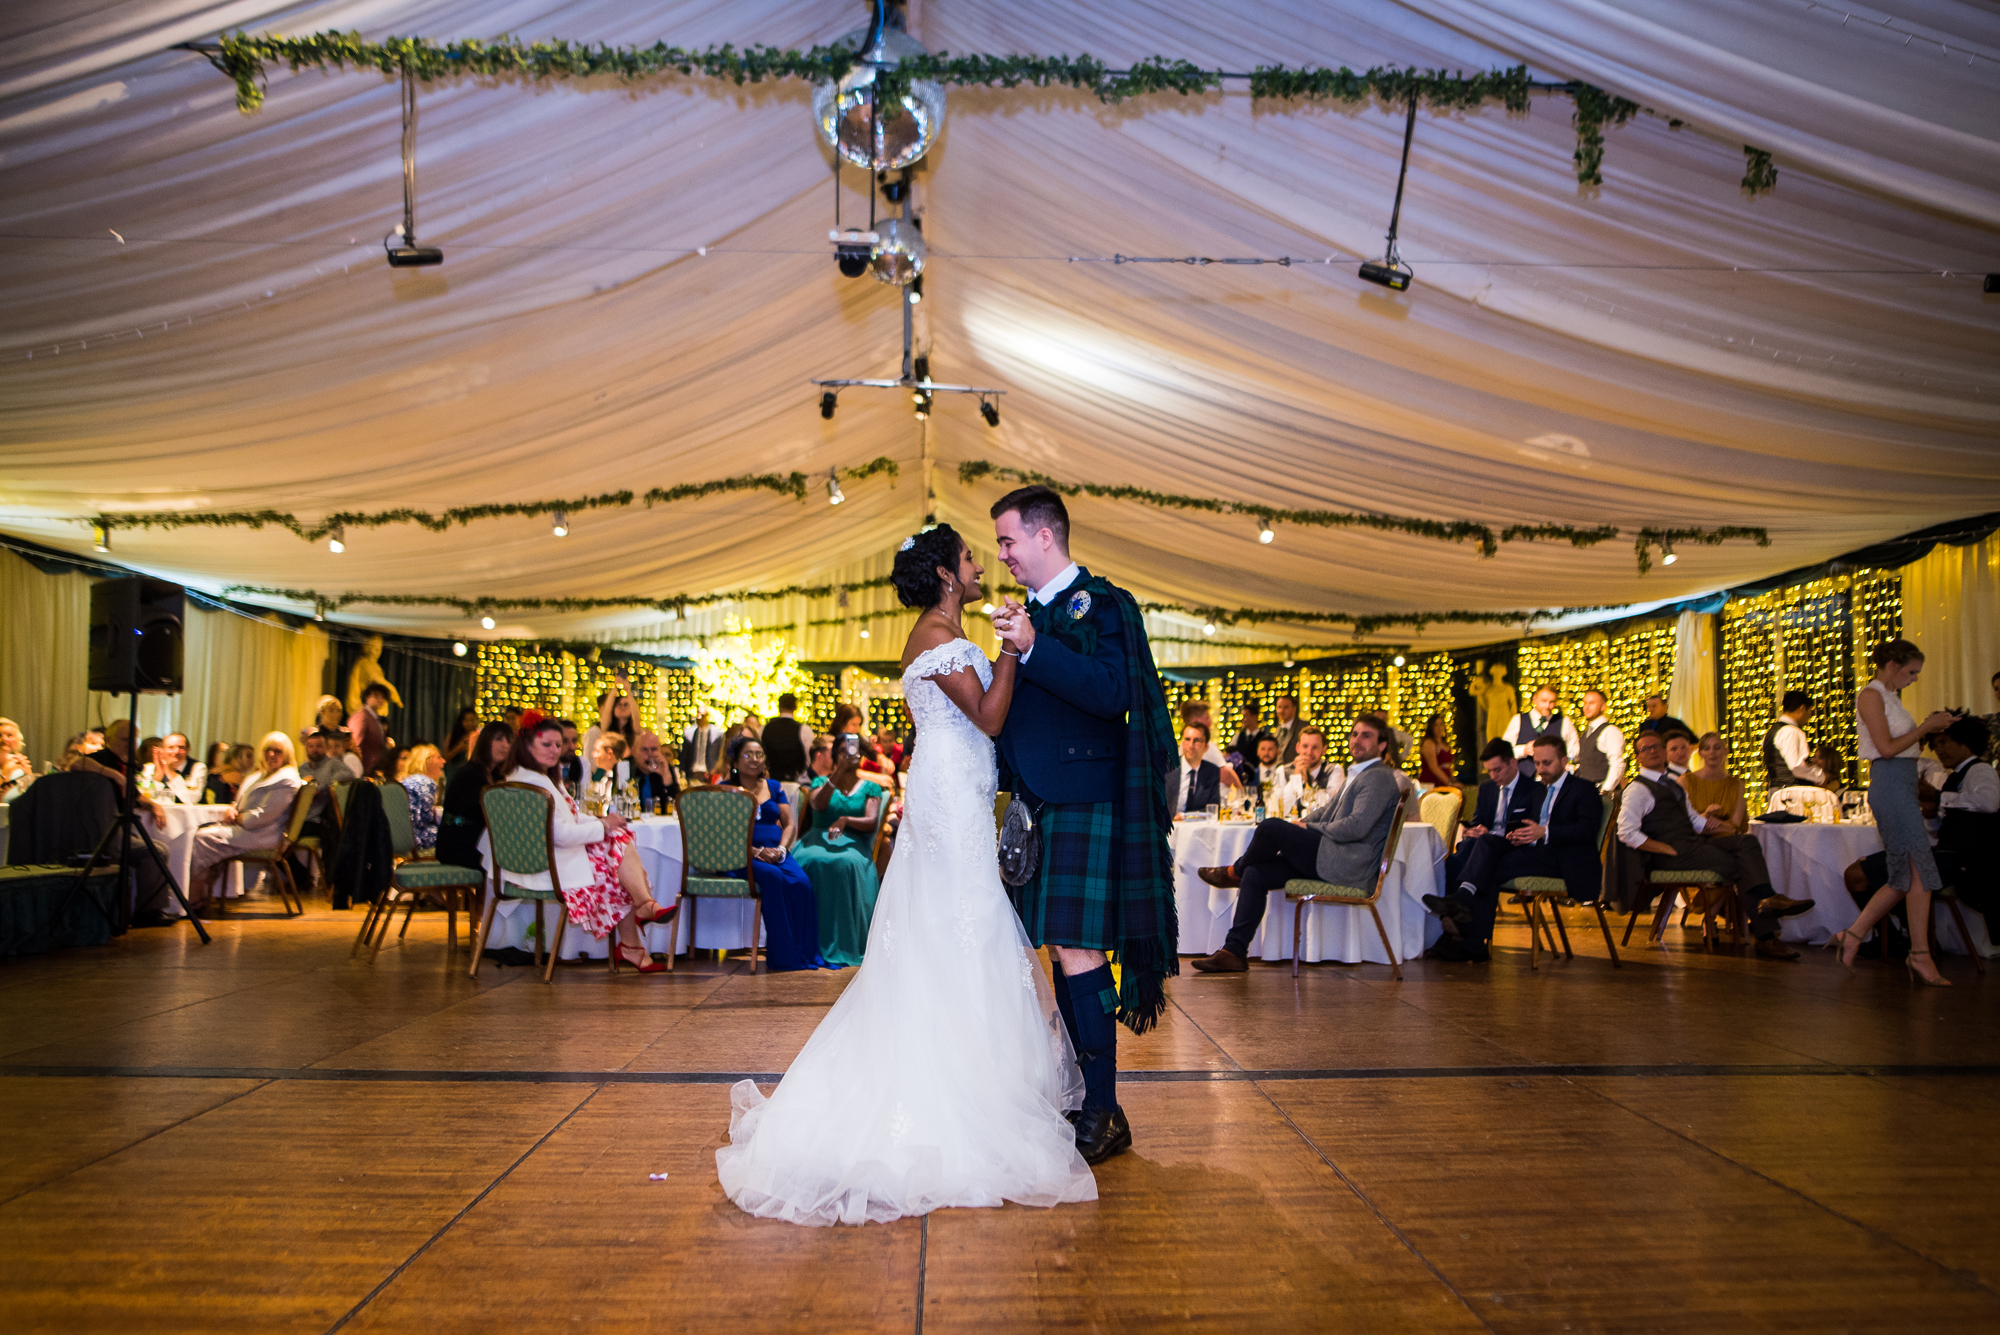 Kev and Shrabani wedding photos (320 of 350).jpg